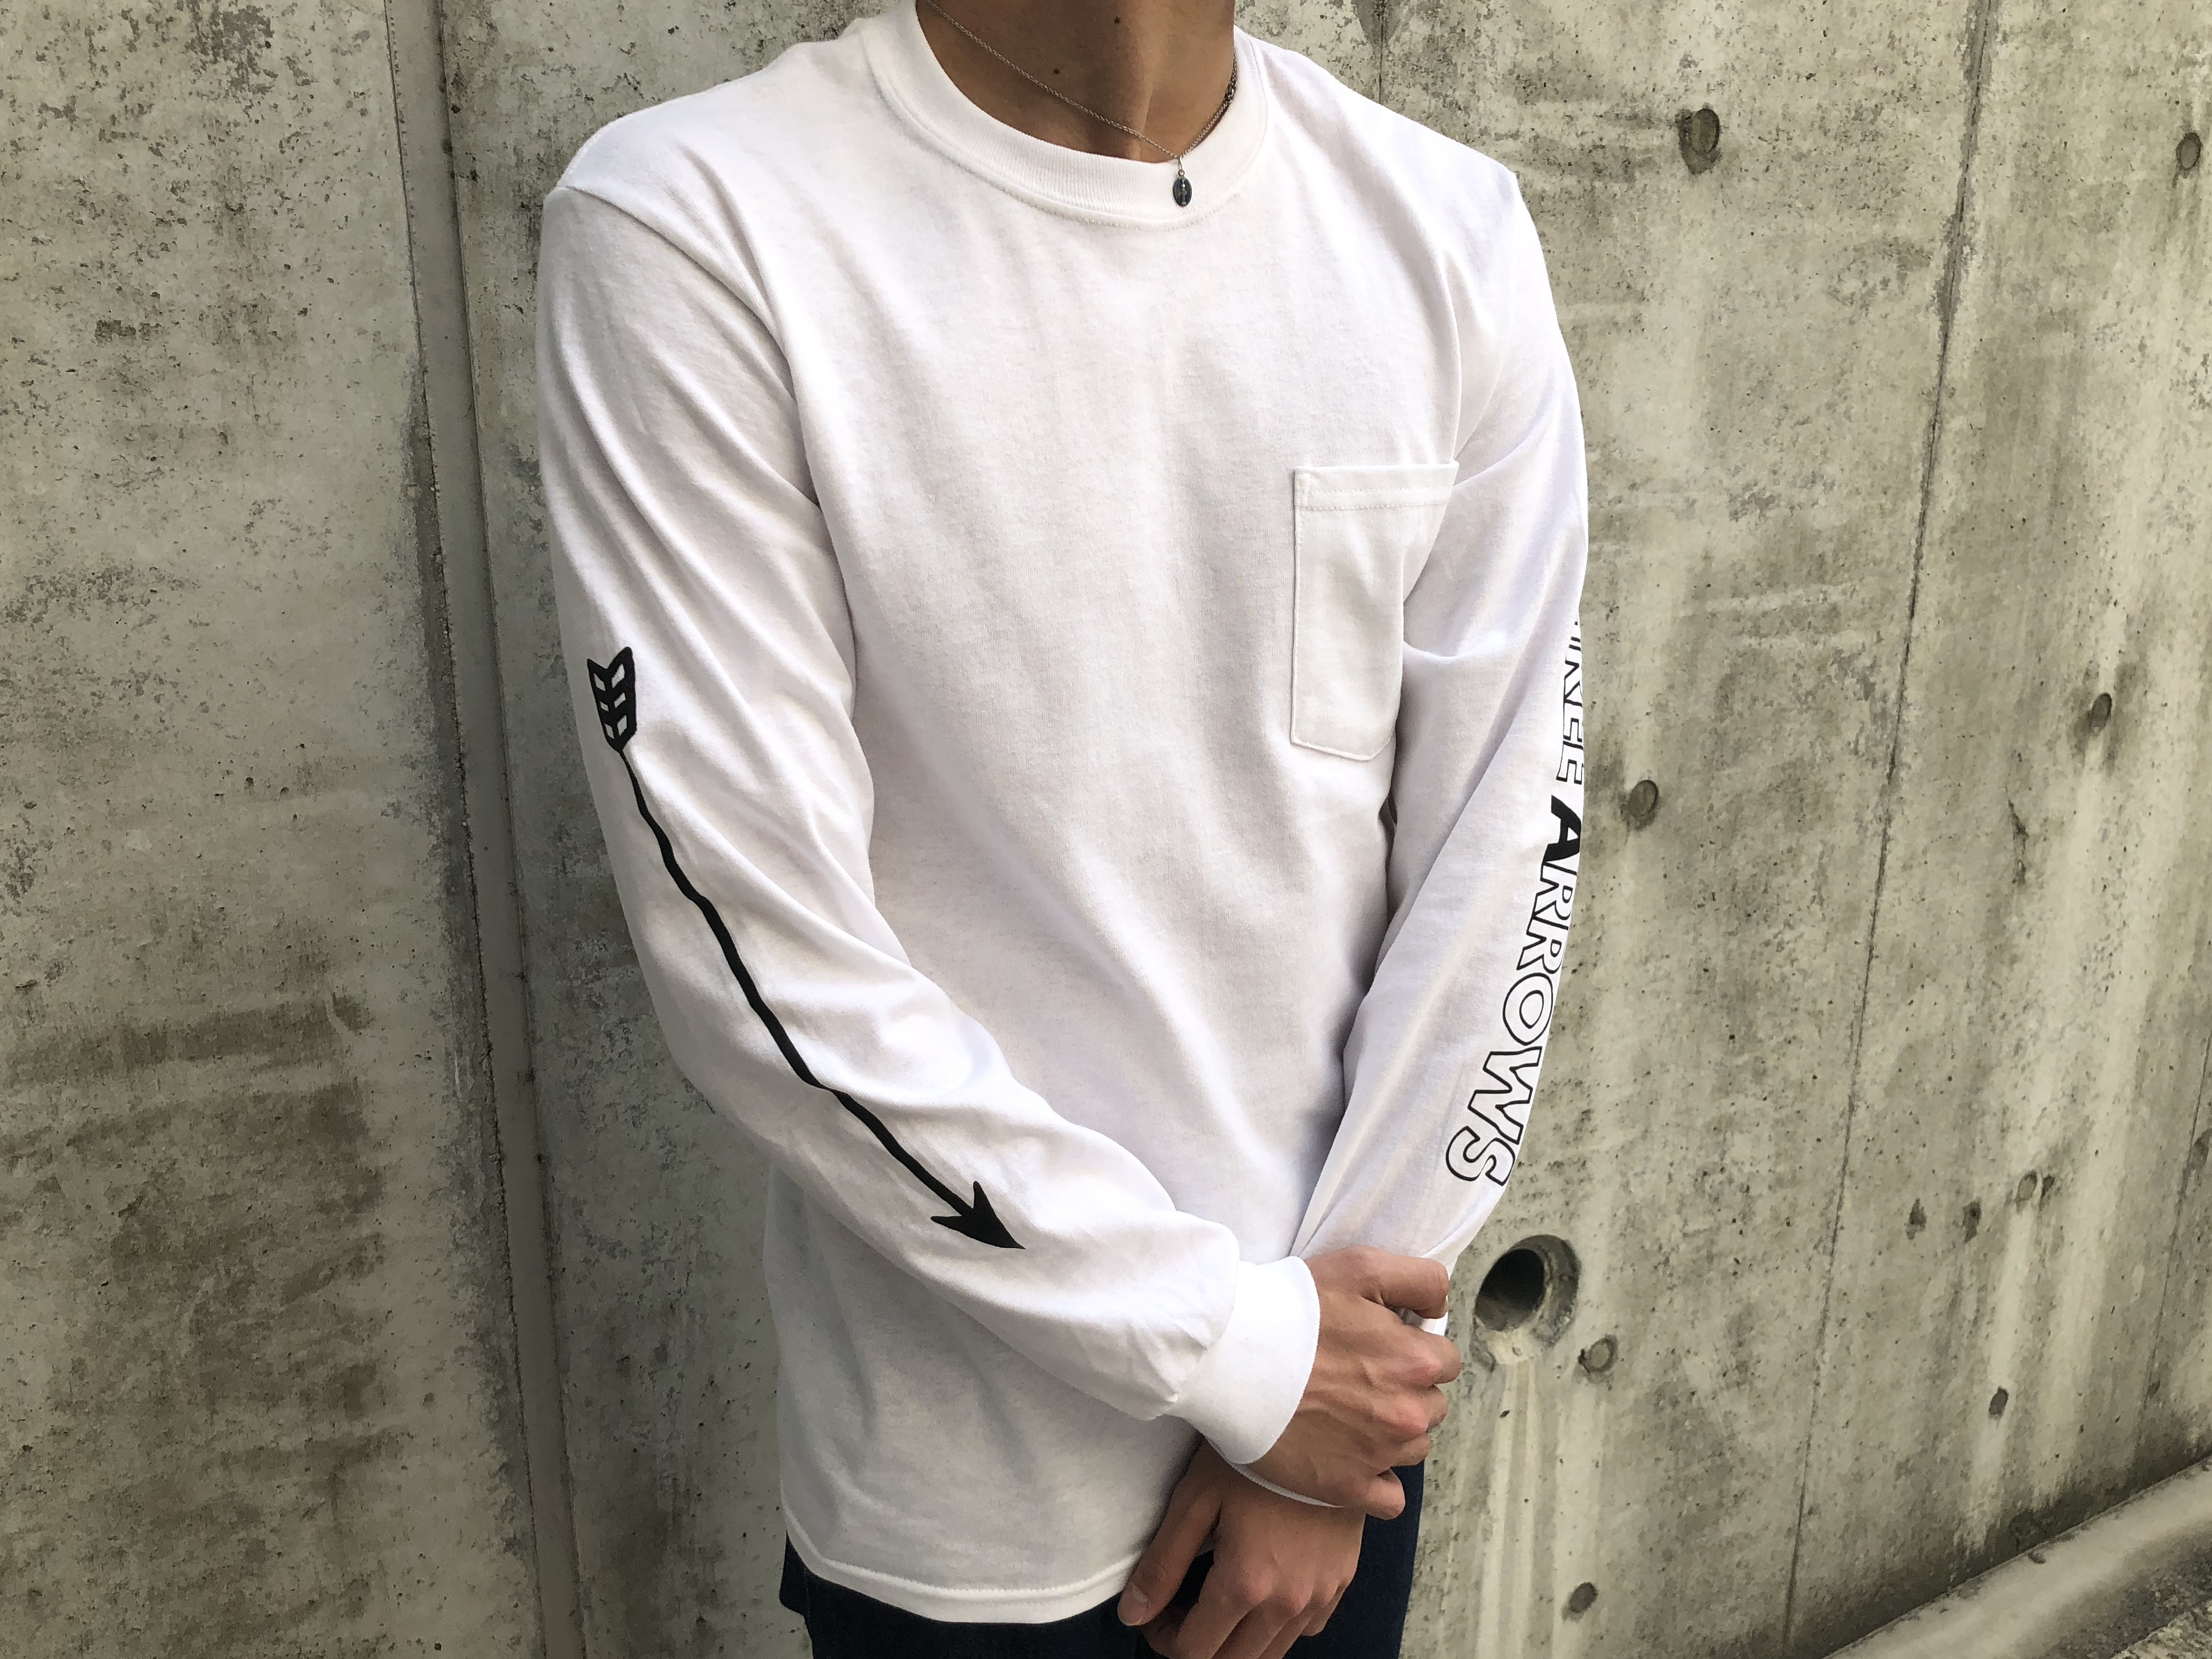 ARROWポケット付きロングTシャツ(white)